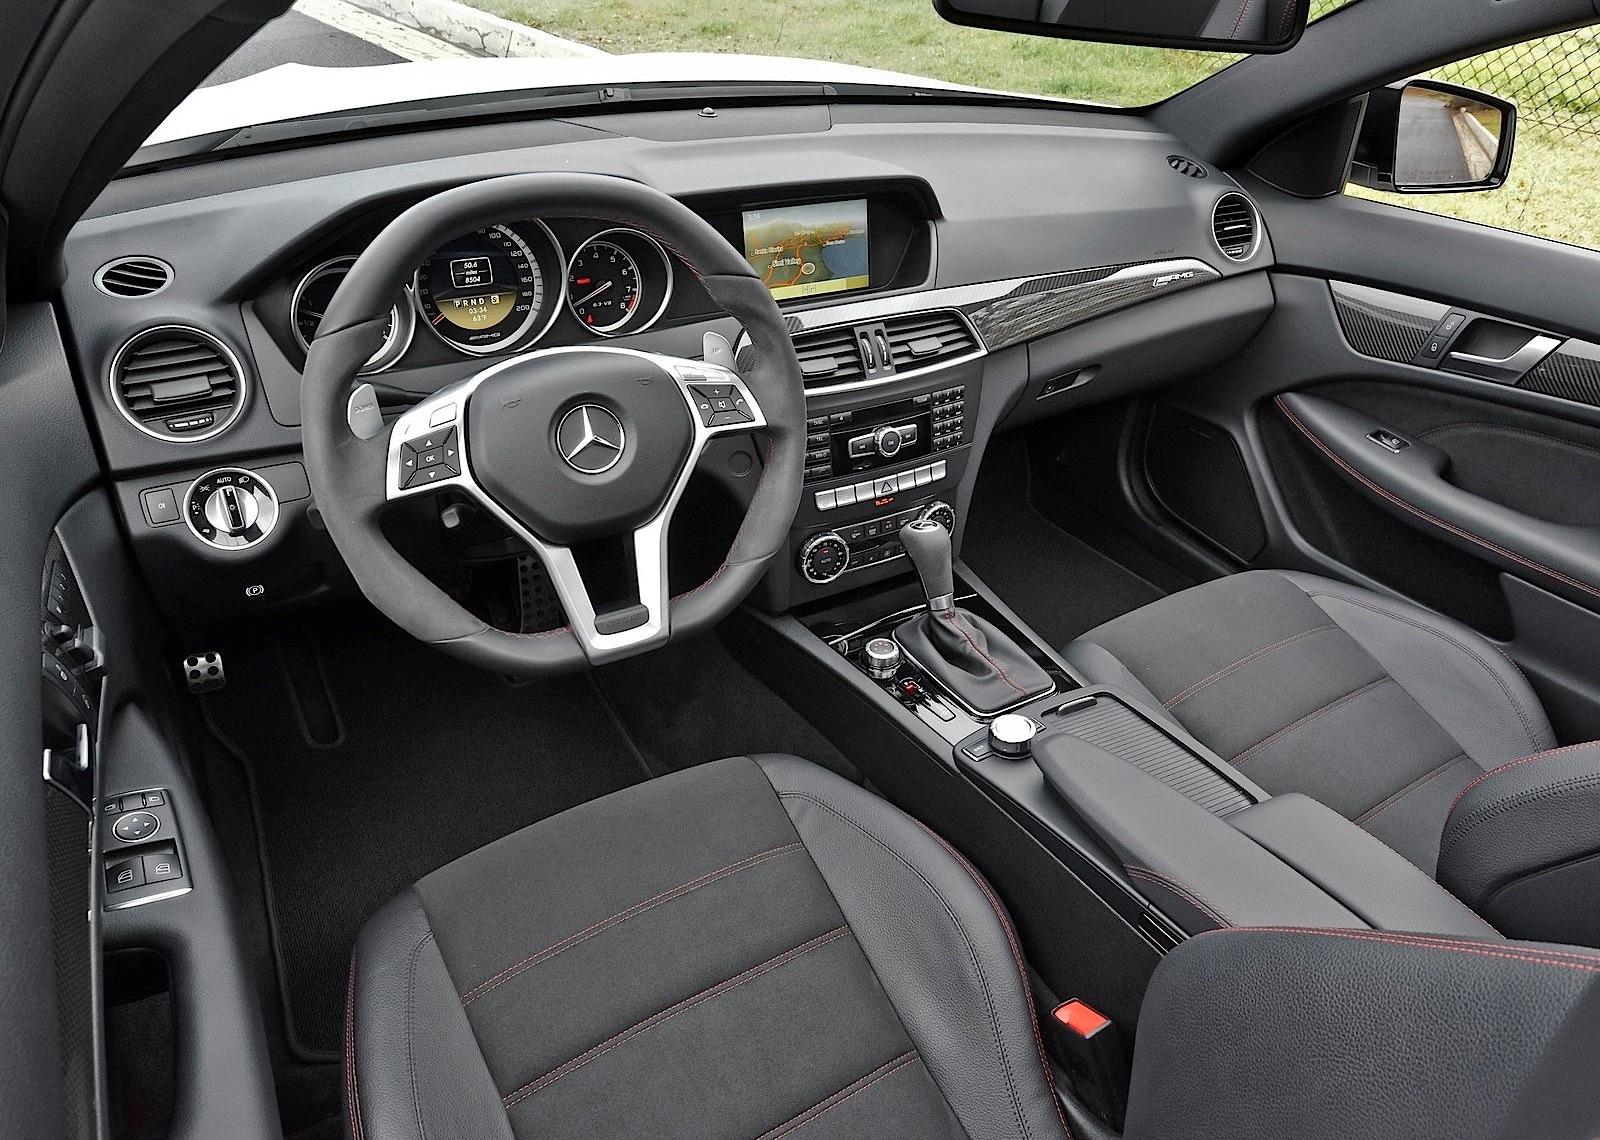 Mercedes Benz C 63 Amg Coupe Black Series 2011 2012